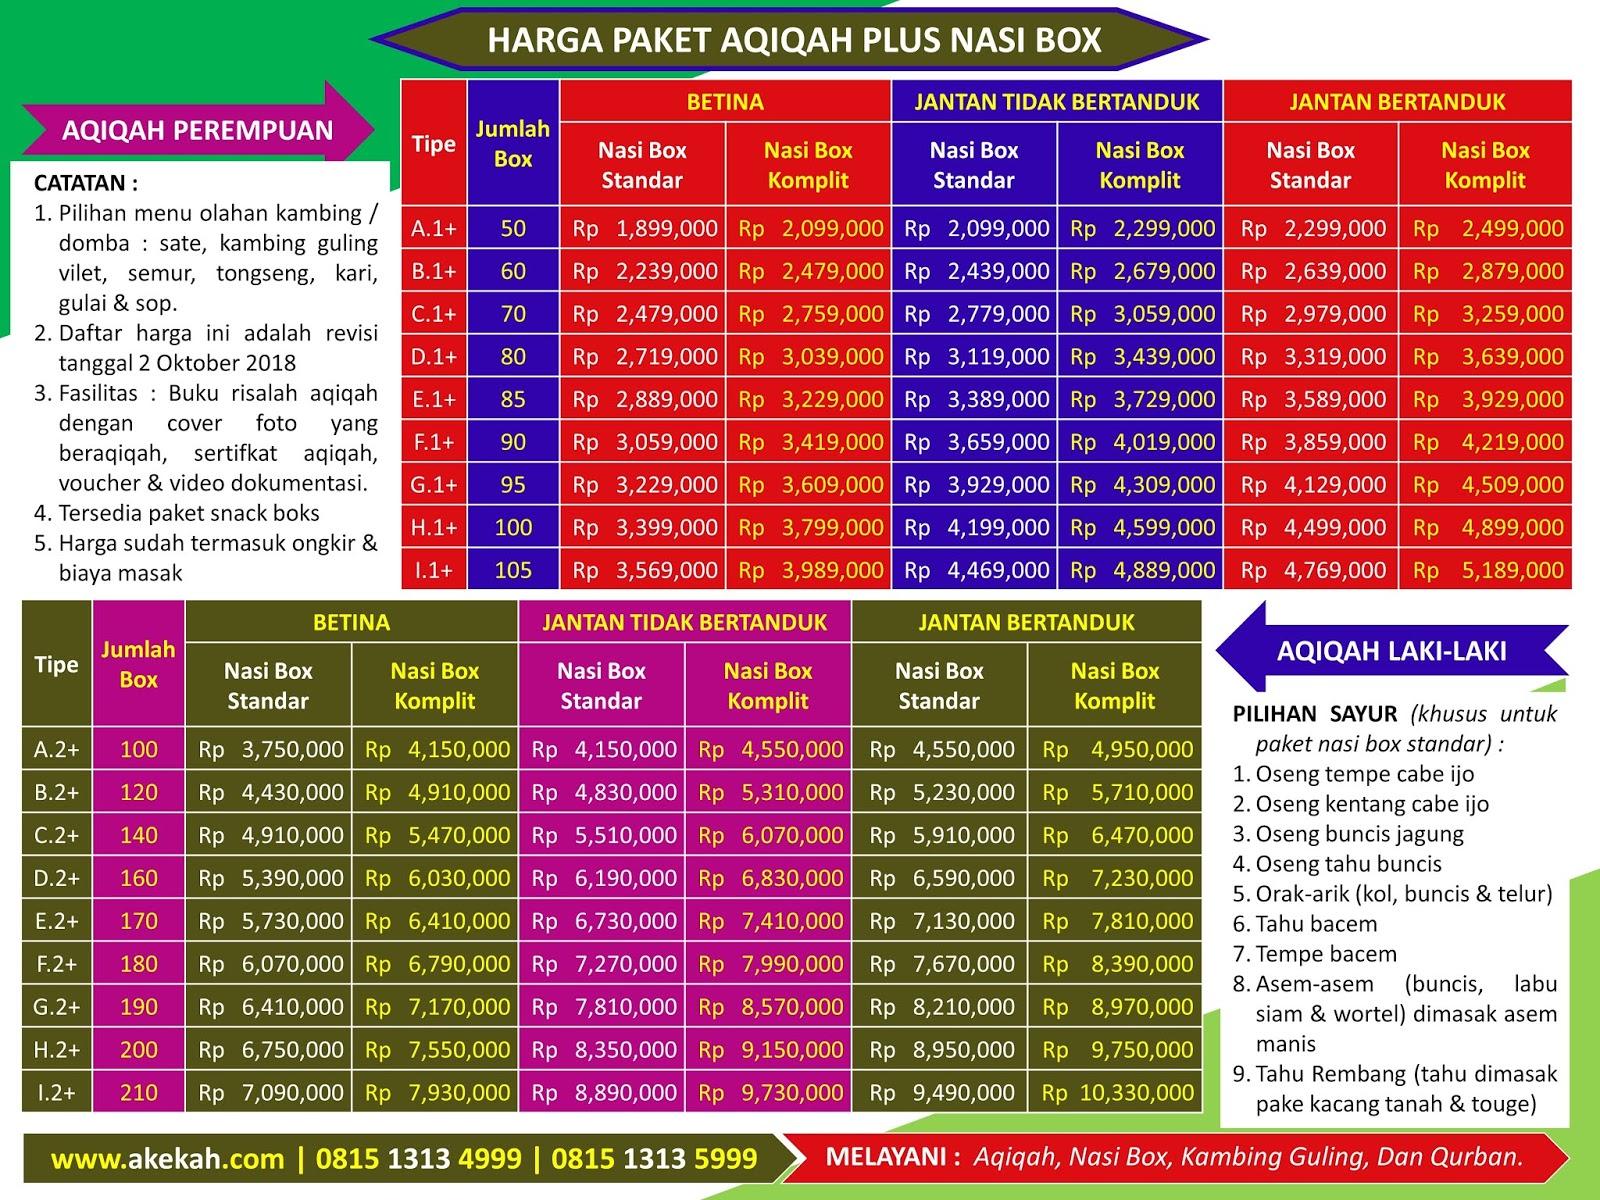 Harga Kambing Akikah Untuk Laki-Laki Daerah Kecamatan Leuwiliang Kabupaten Bogor